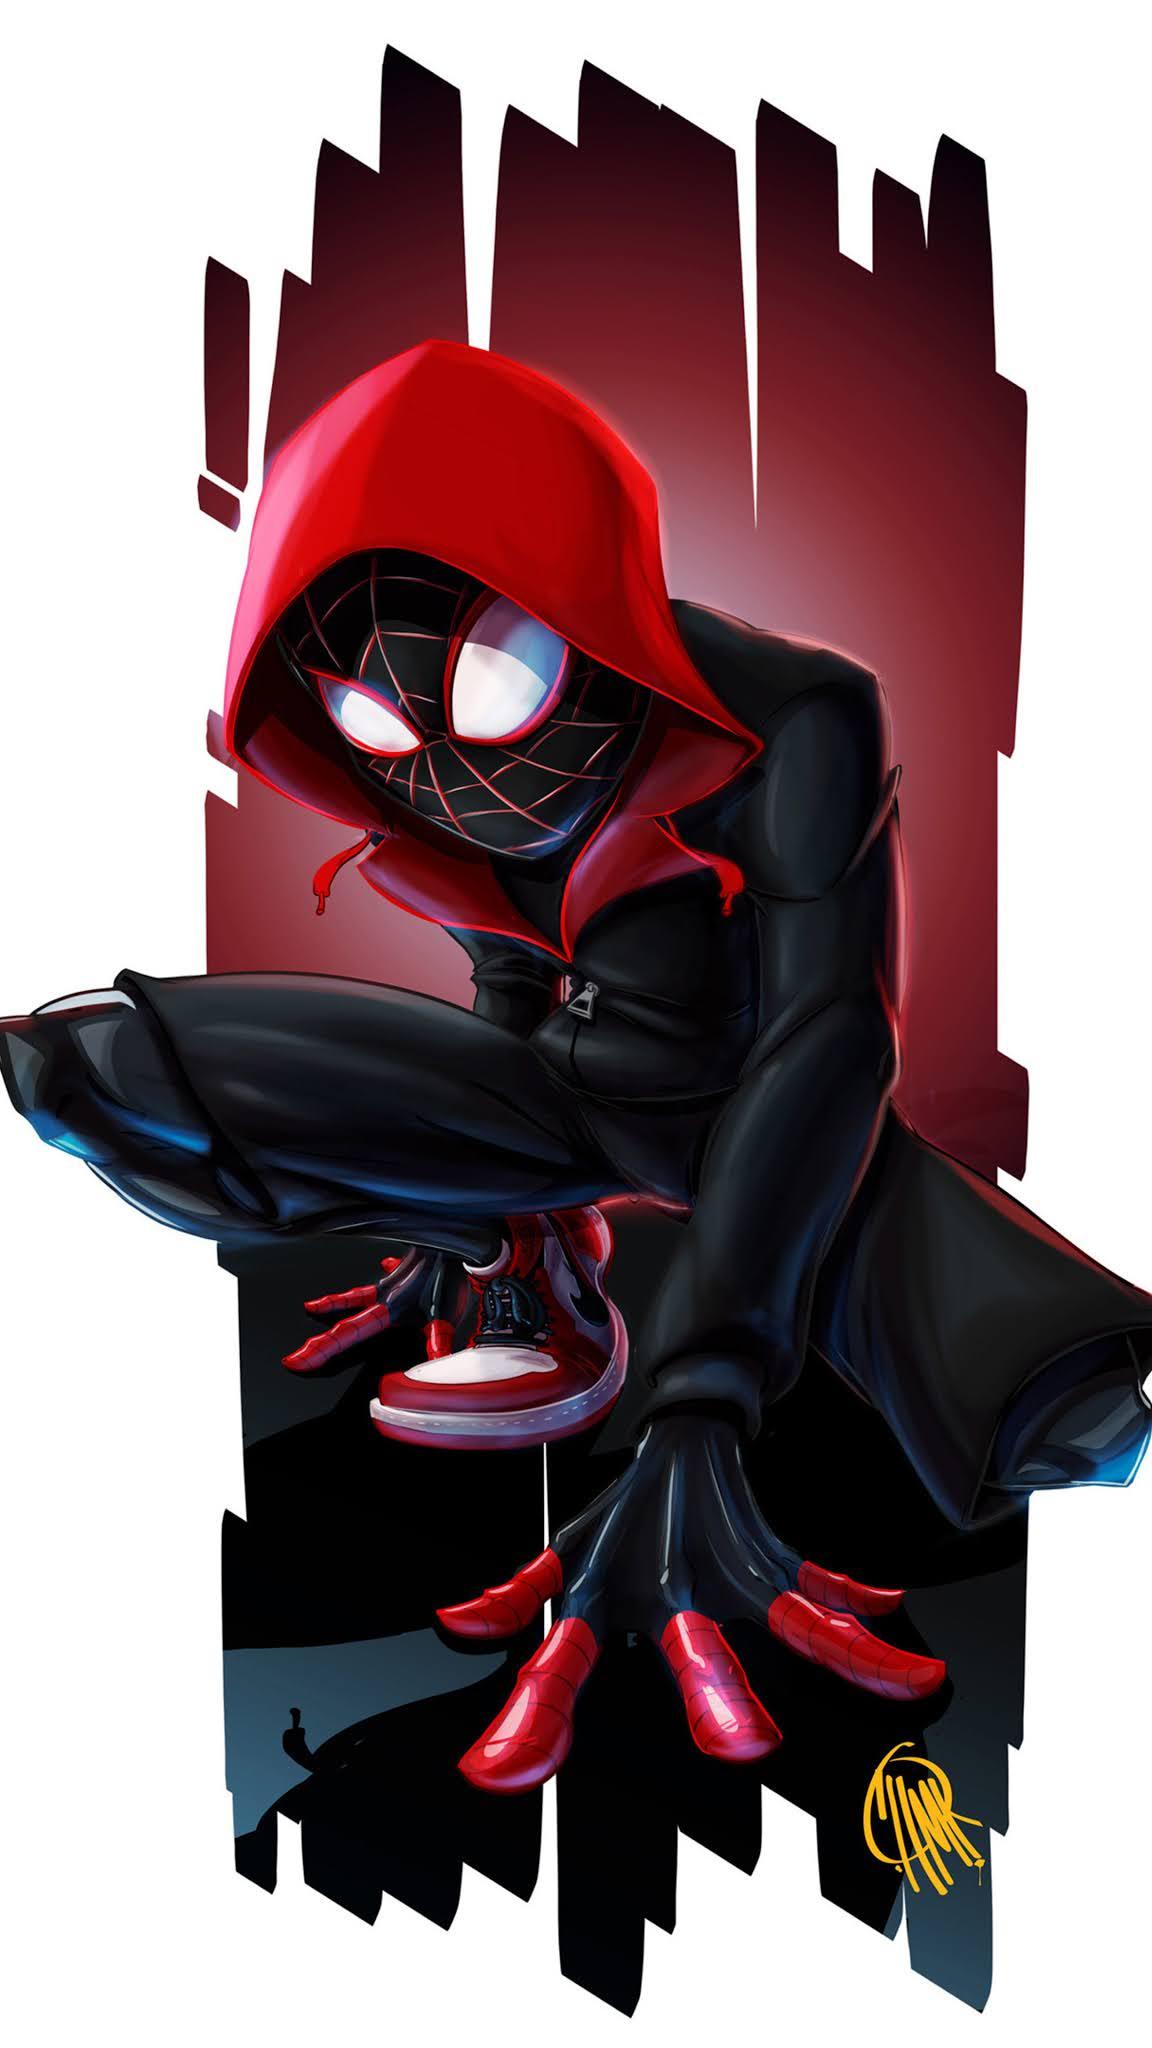 Spiderman Miles Morales Art 4k wallpaper